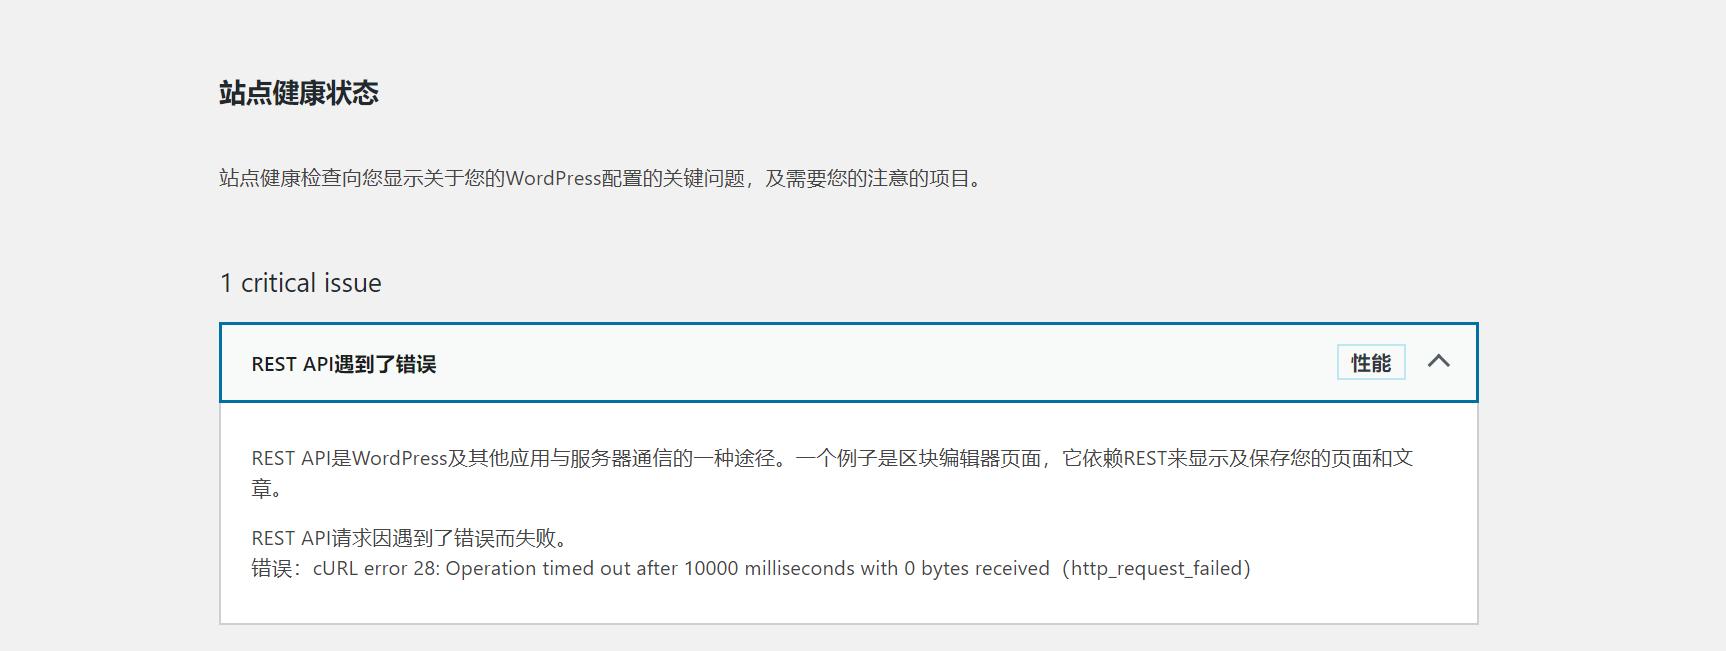 WordPress站点健康提示遇到错误如何解决? (https://www.yunsxr.com/) WordPress基础教程 第1张